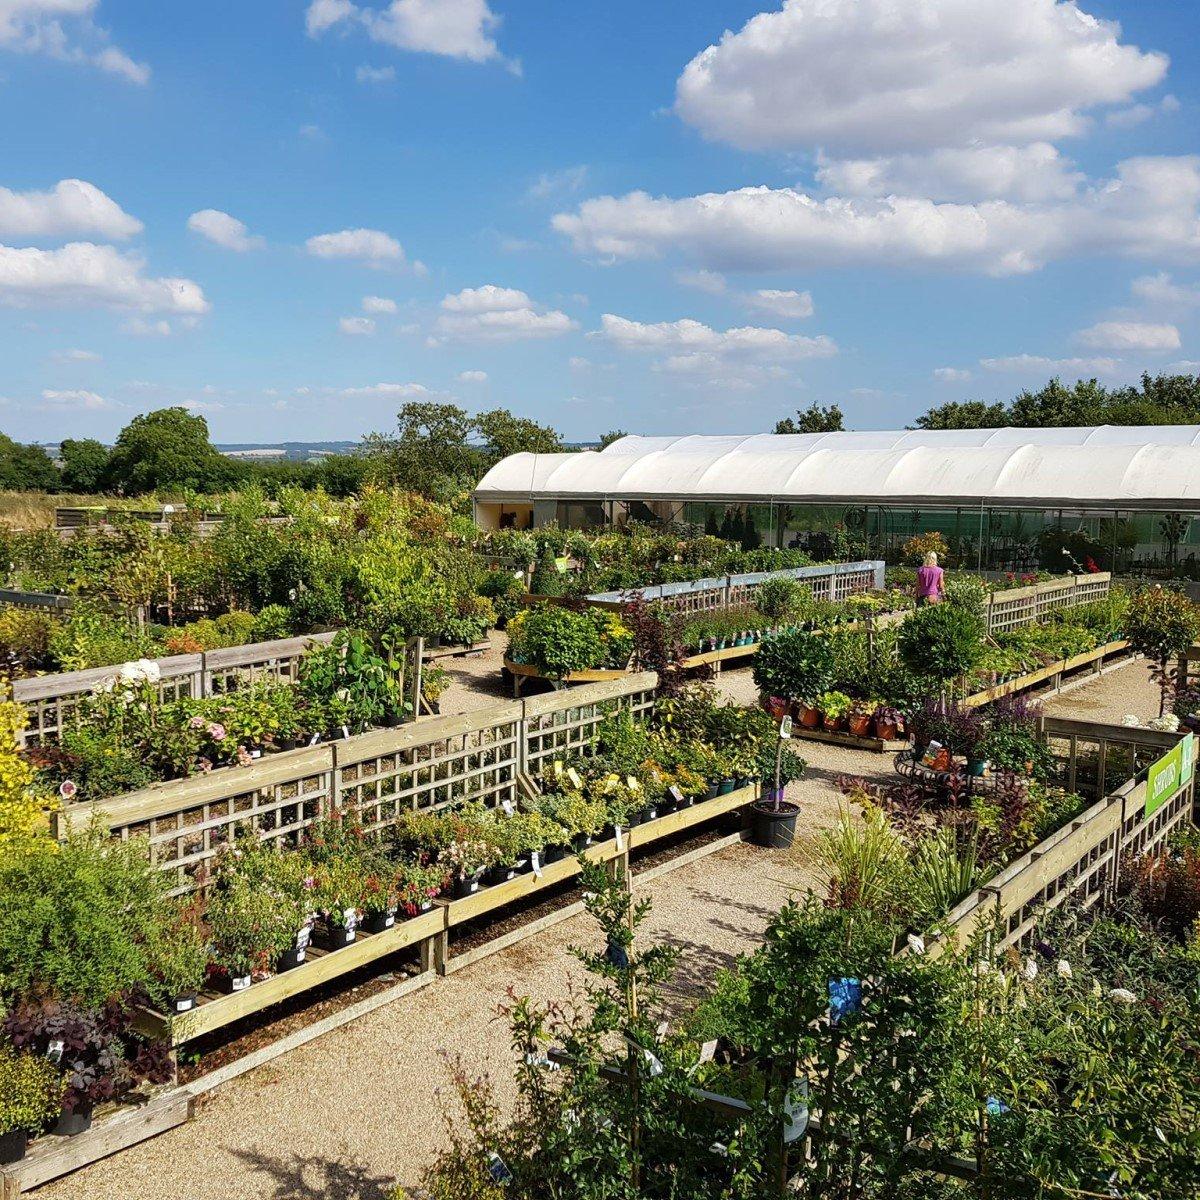 Garden centres to visit in Oxfordshire - Root One Garden Centre